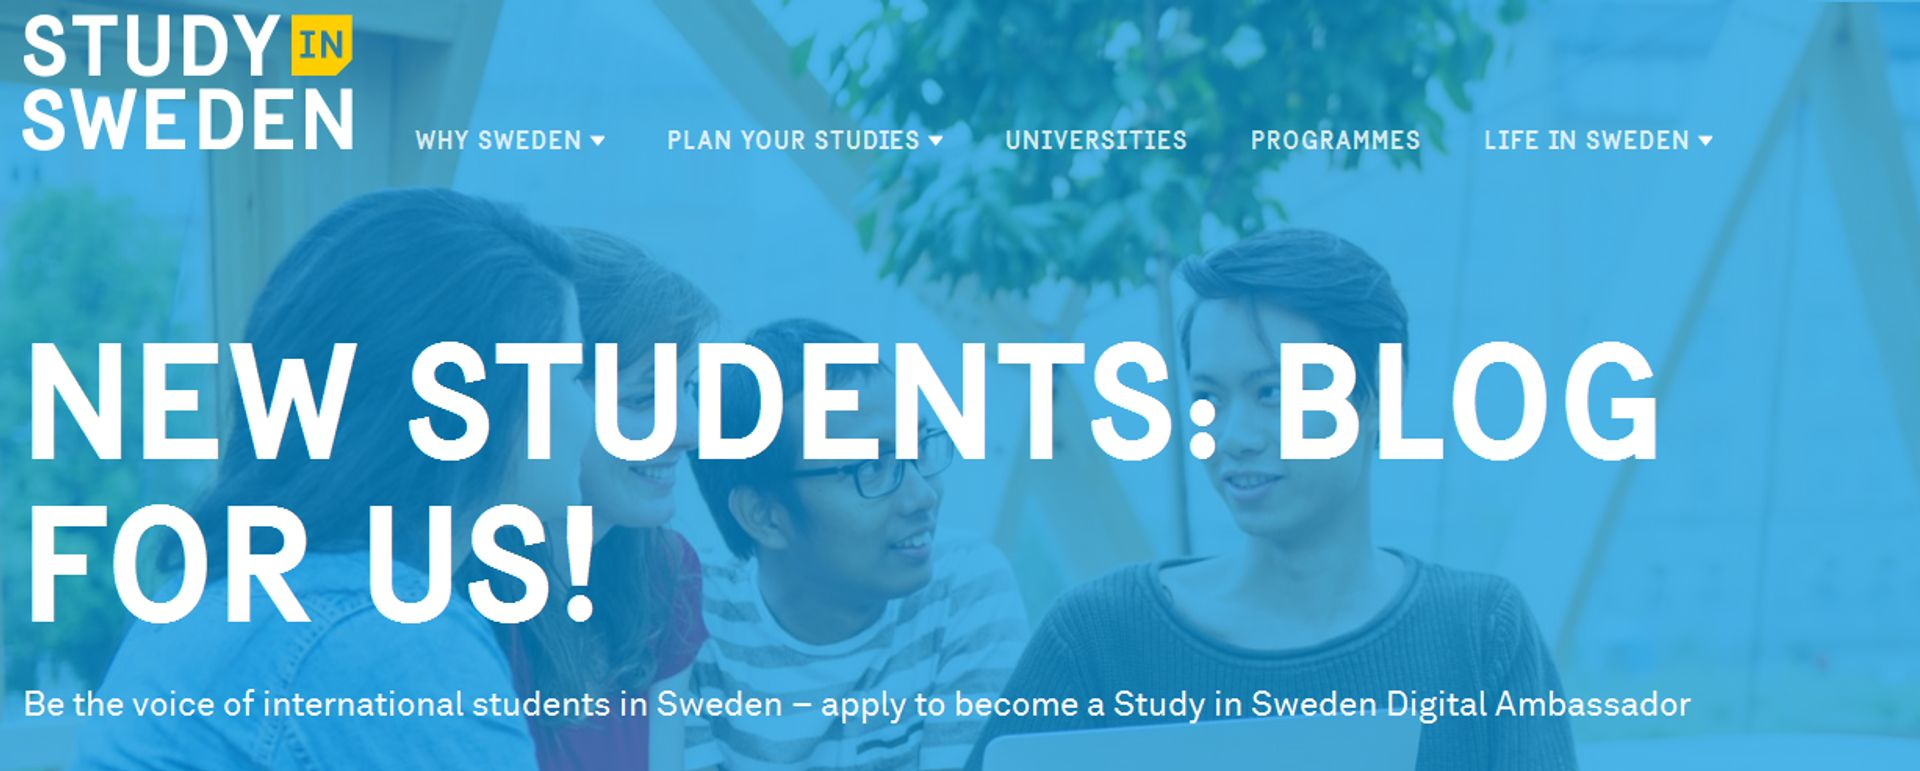 Blog for Study in Sweden